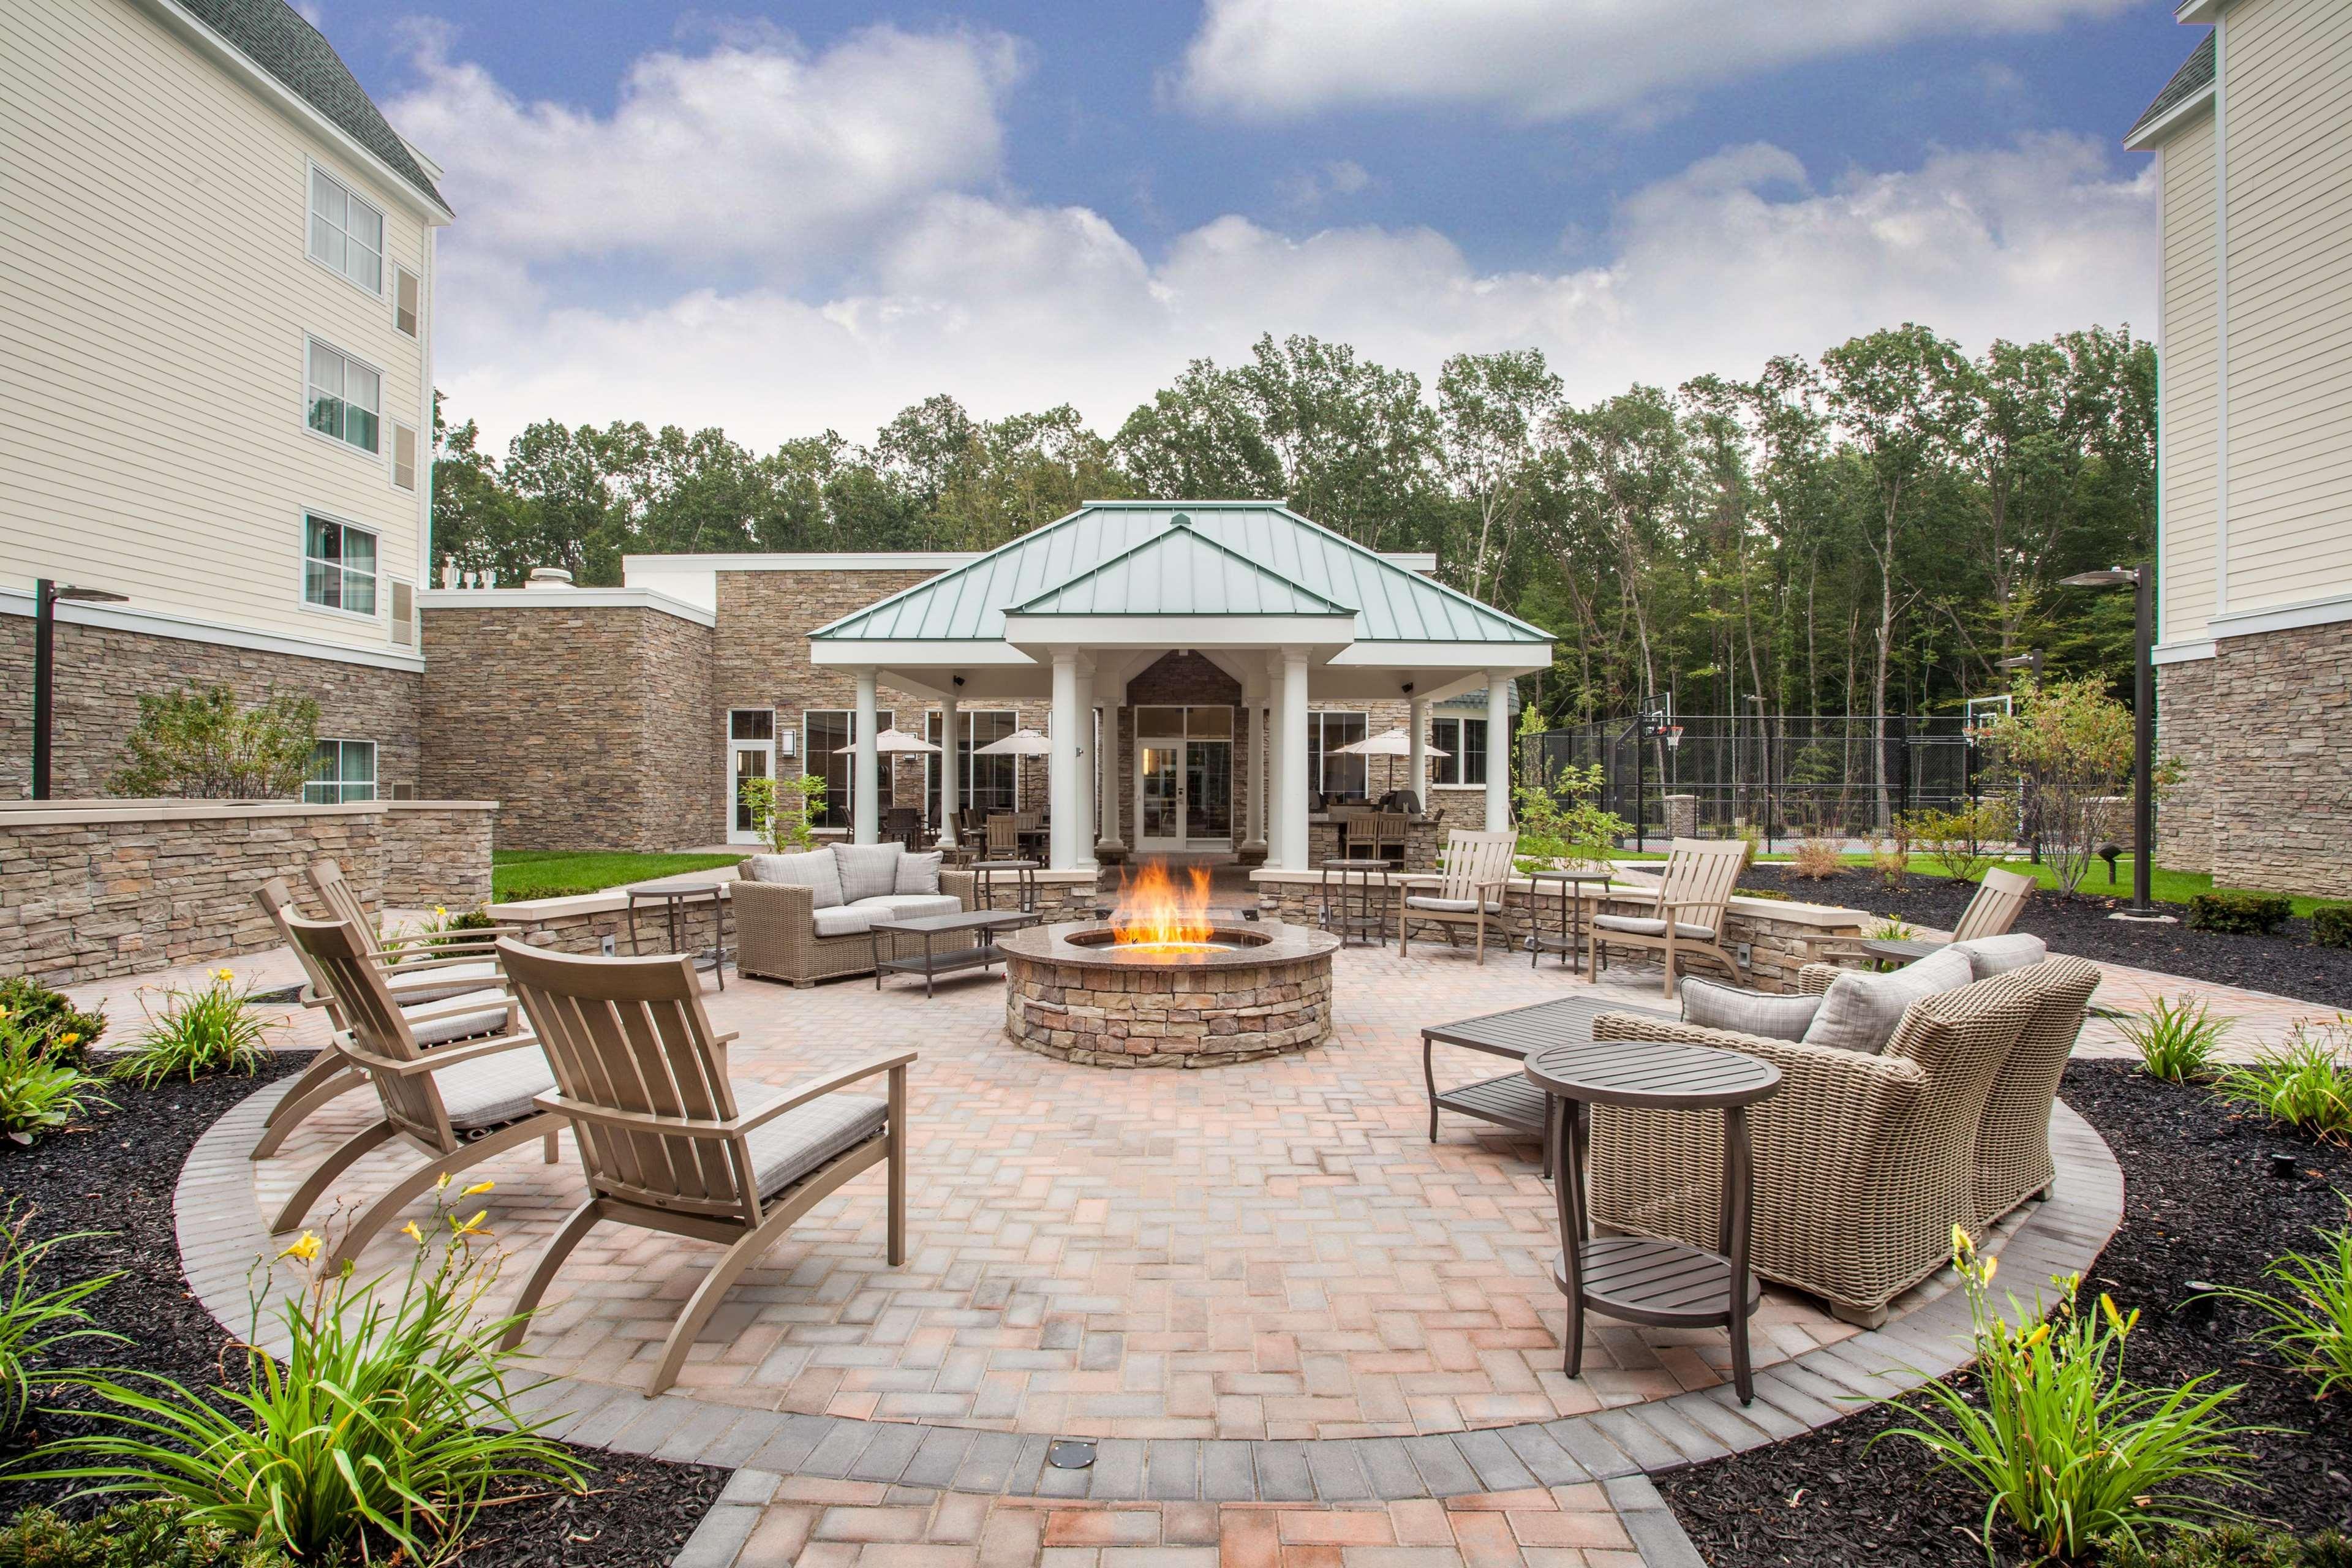 Homewood Suites by Hilton Saratoga Springs image 42